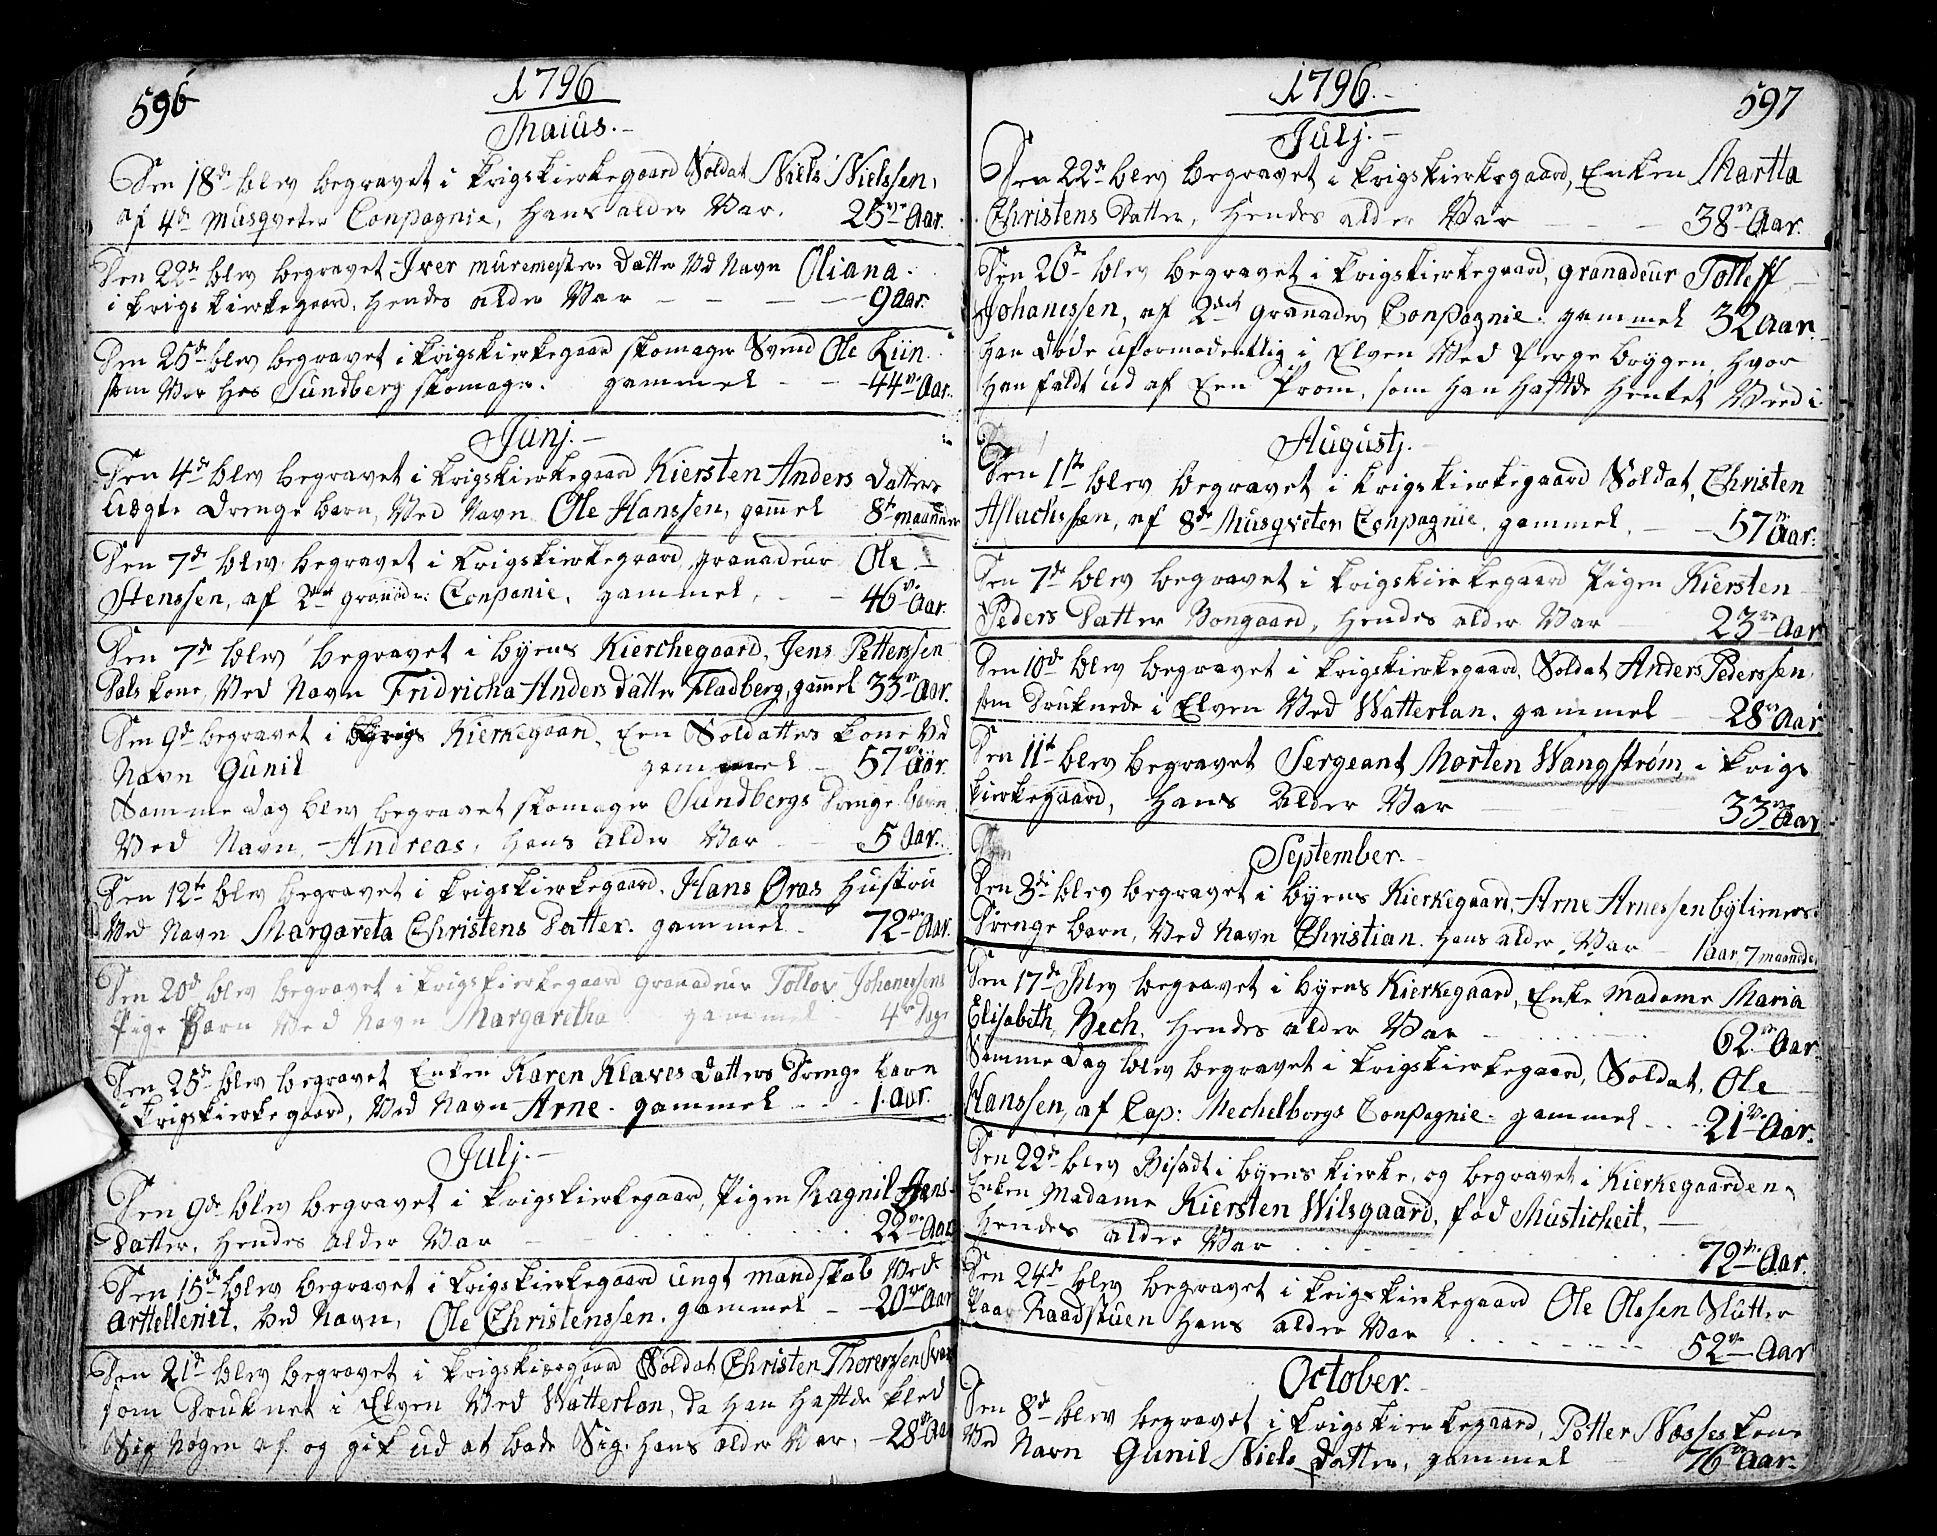 SAO, Fredrikstad prestekontor Kirkebøker, F/Fa/L0002: Ministerialbok nr. 2, 1750-1804, s. 596-597